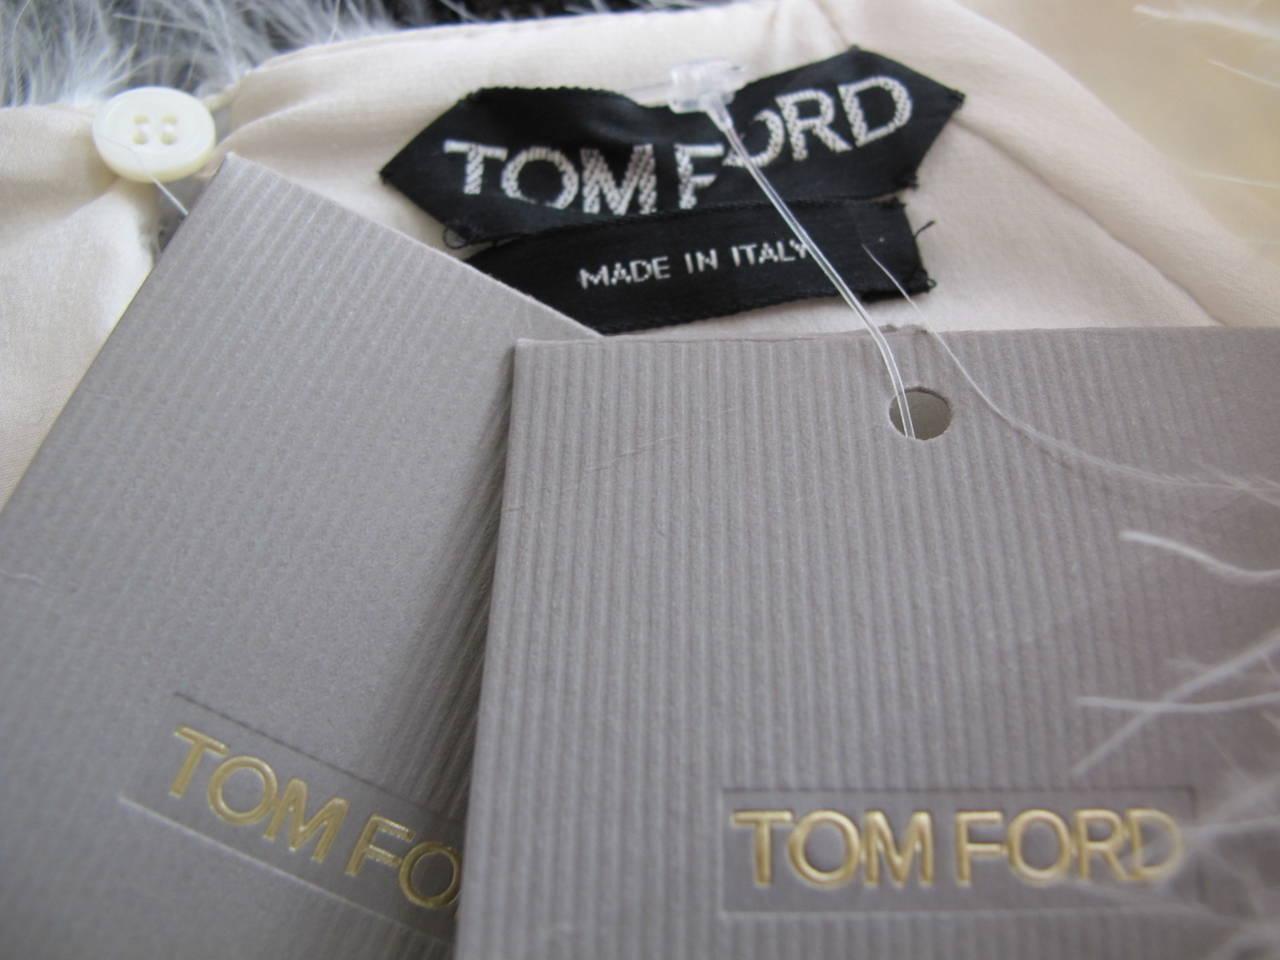 Tom Ford New Luxurious Marabou Jacket 2012 8